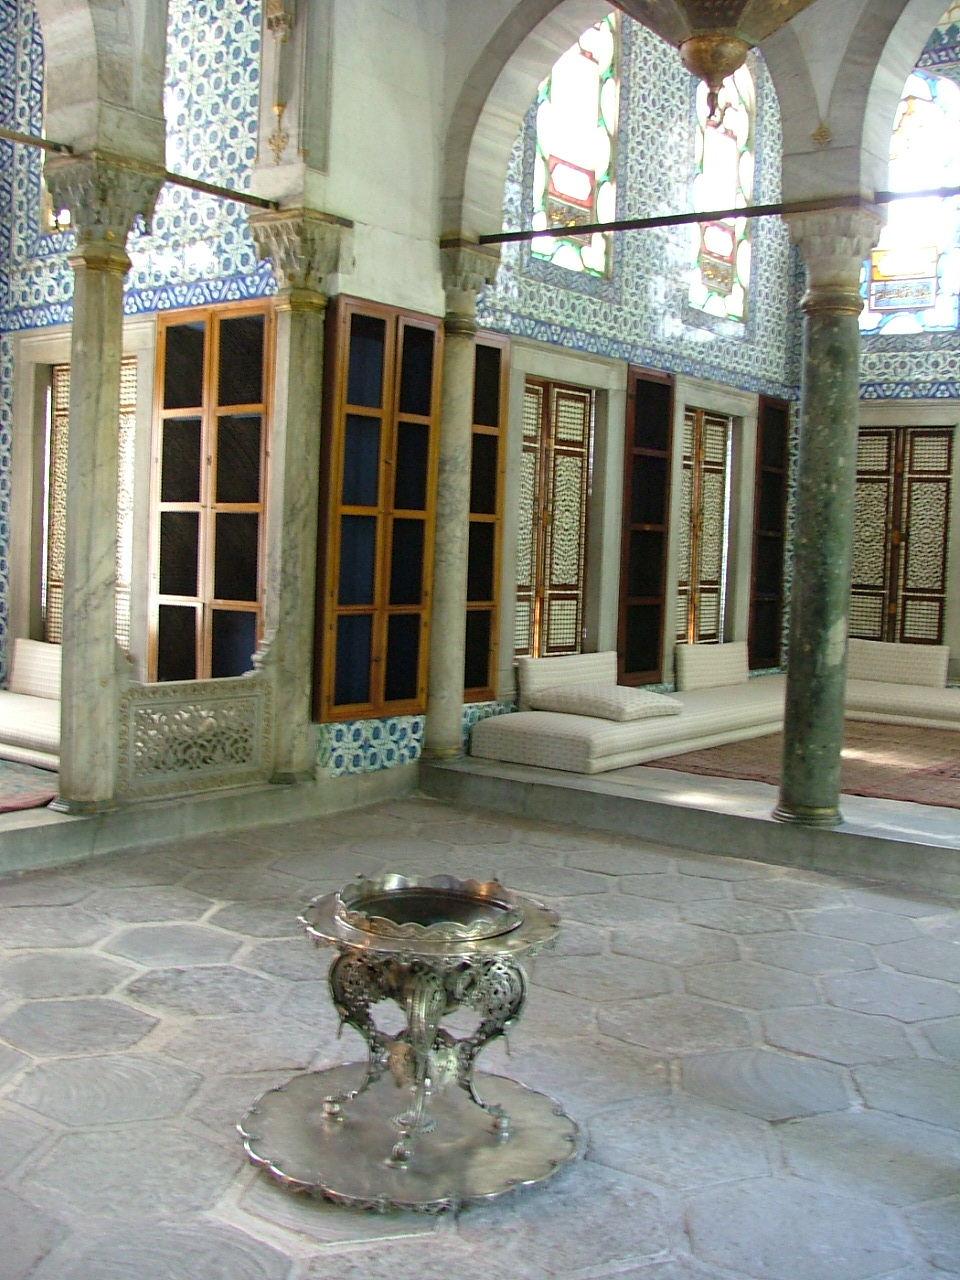 Topkapi Palace, Istanbul, Turkey, Harem interior